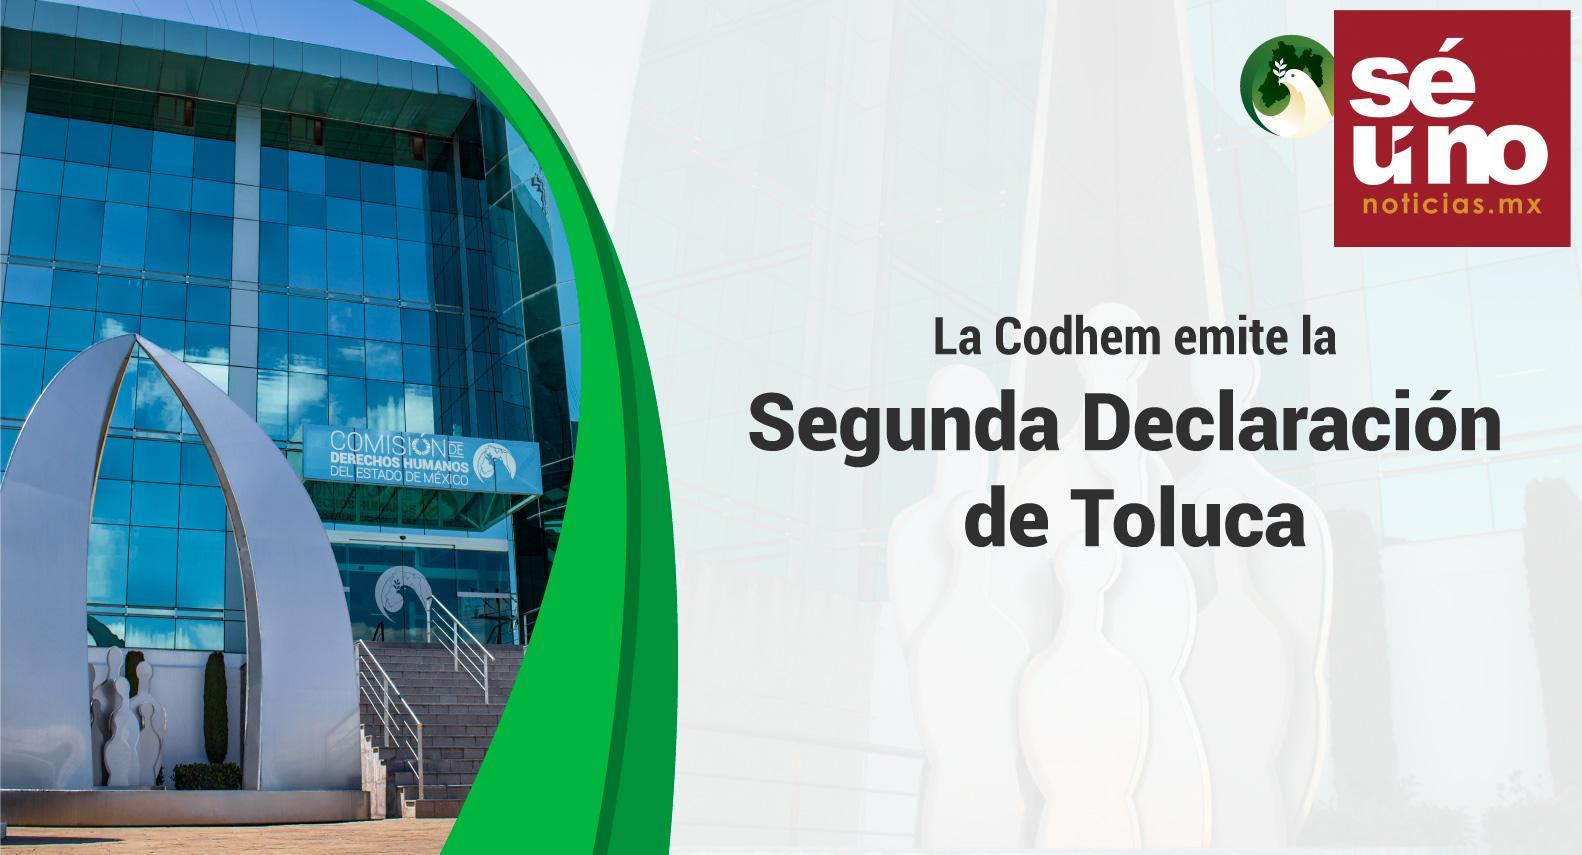 CODHEM promulga la Segunda declaración de Toluca